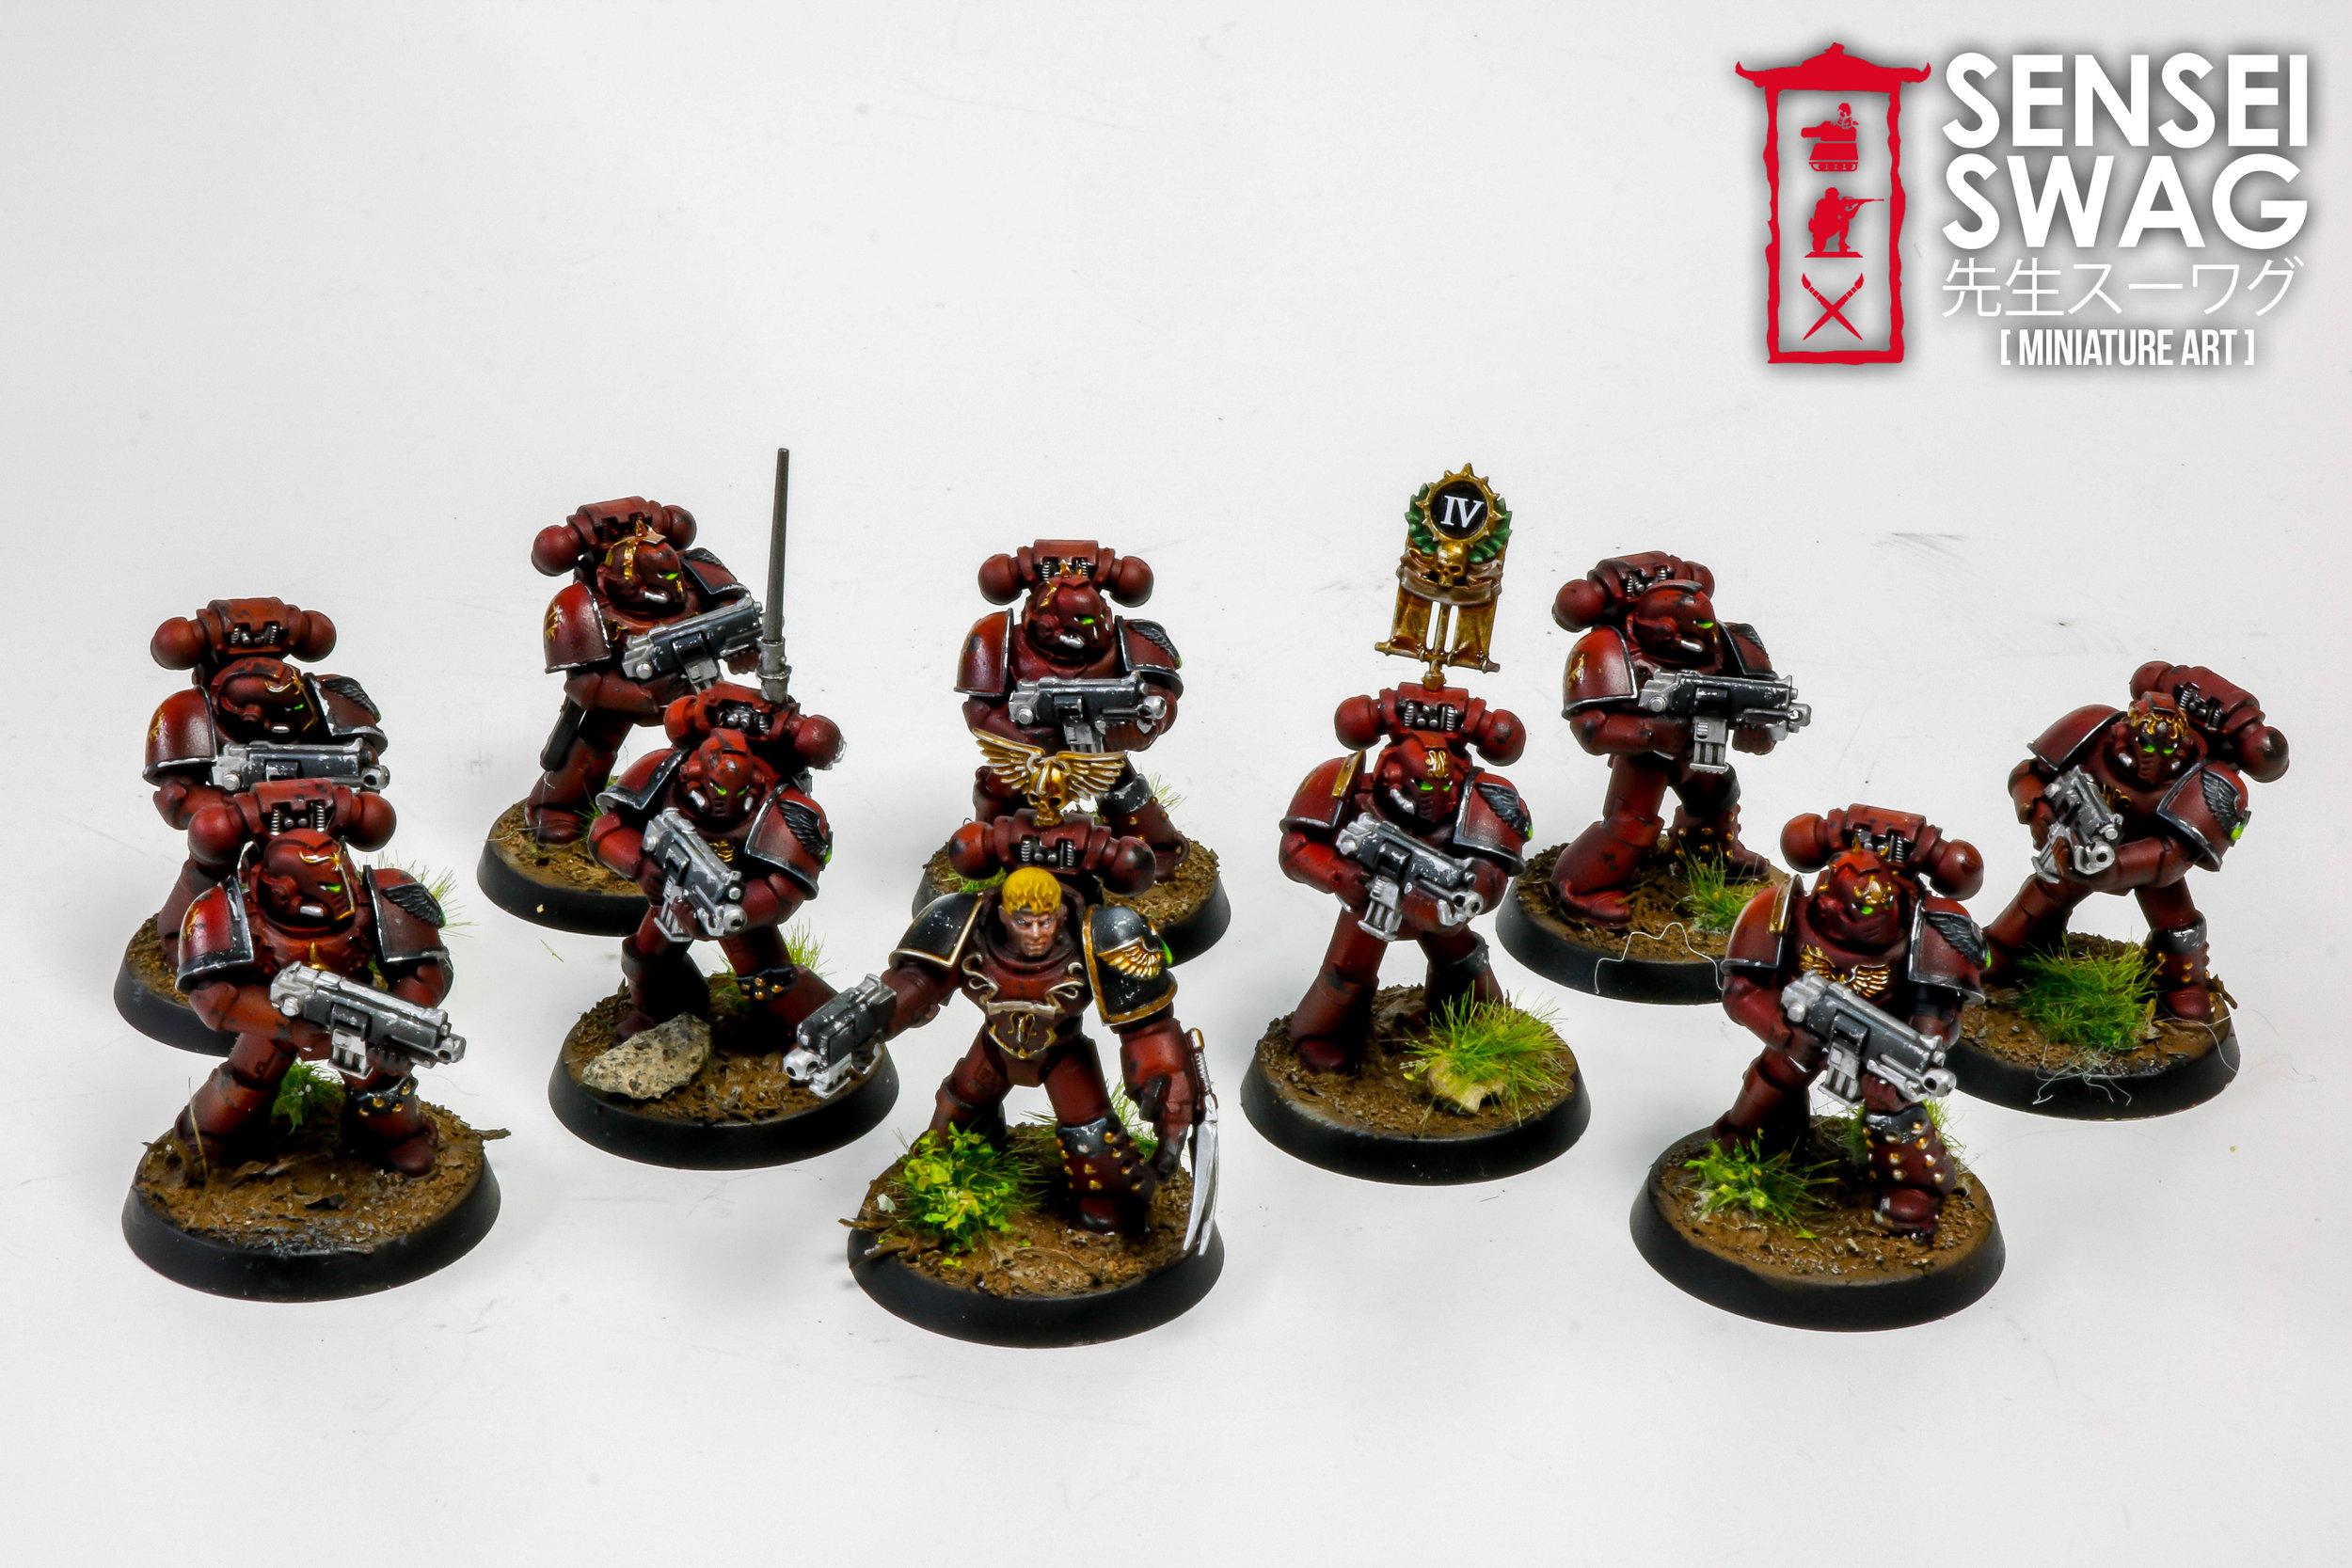 Blood Angels Horus Heresy Spartan Fire Raptor Legionnaires-6.jpg